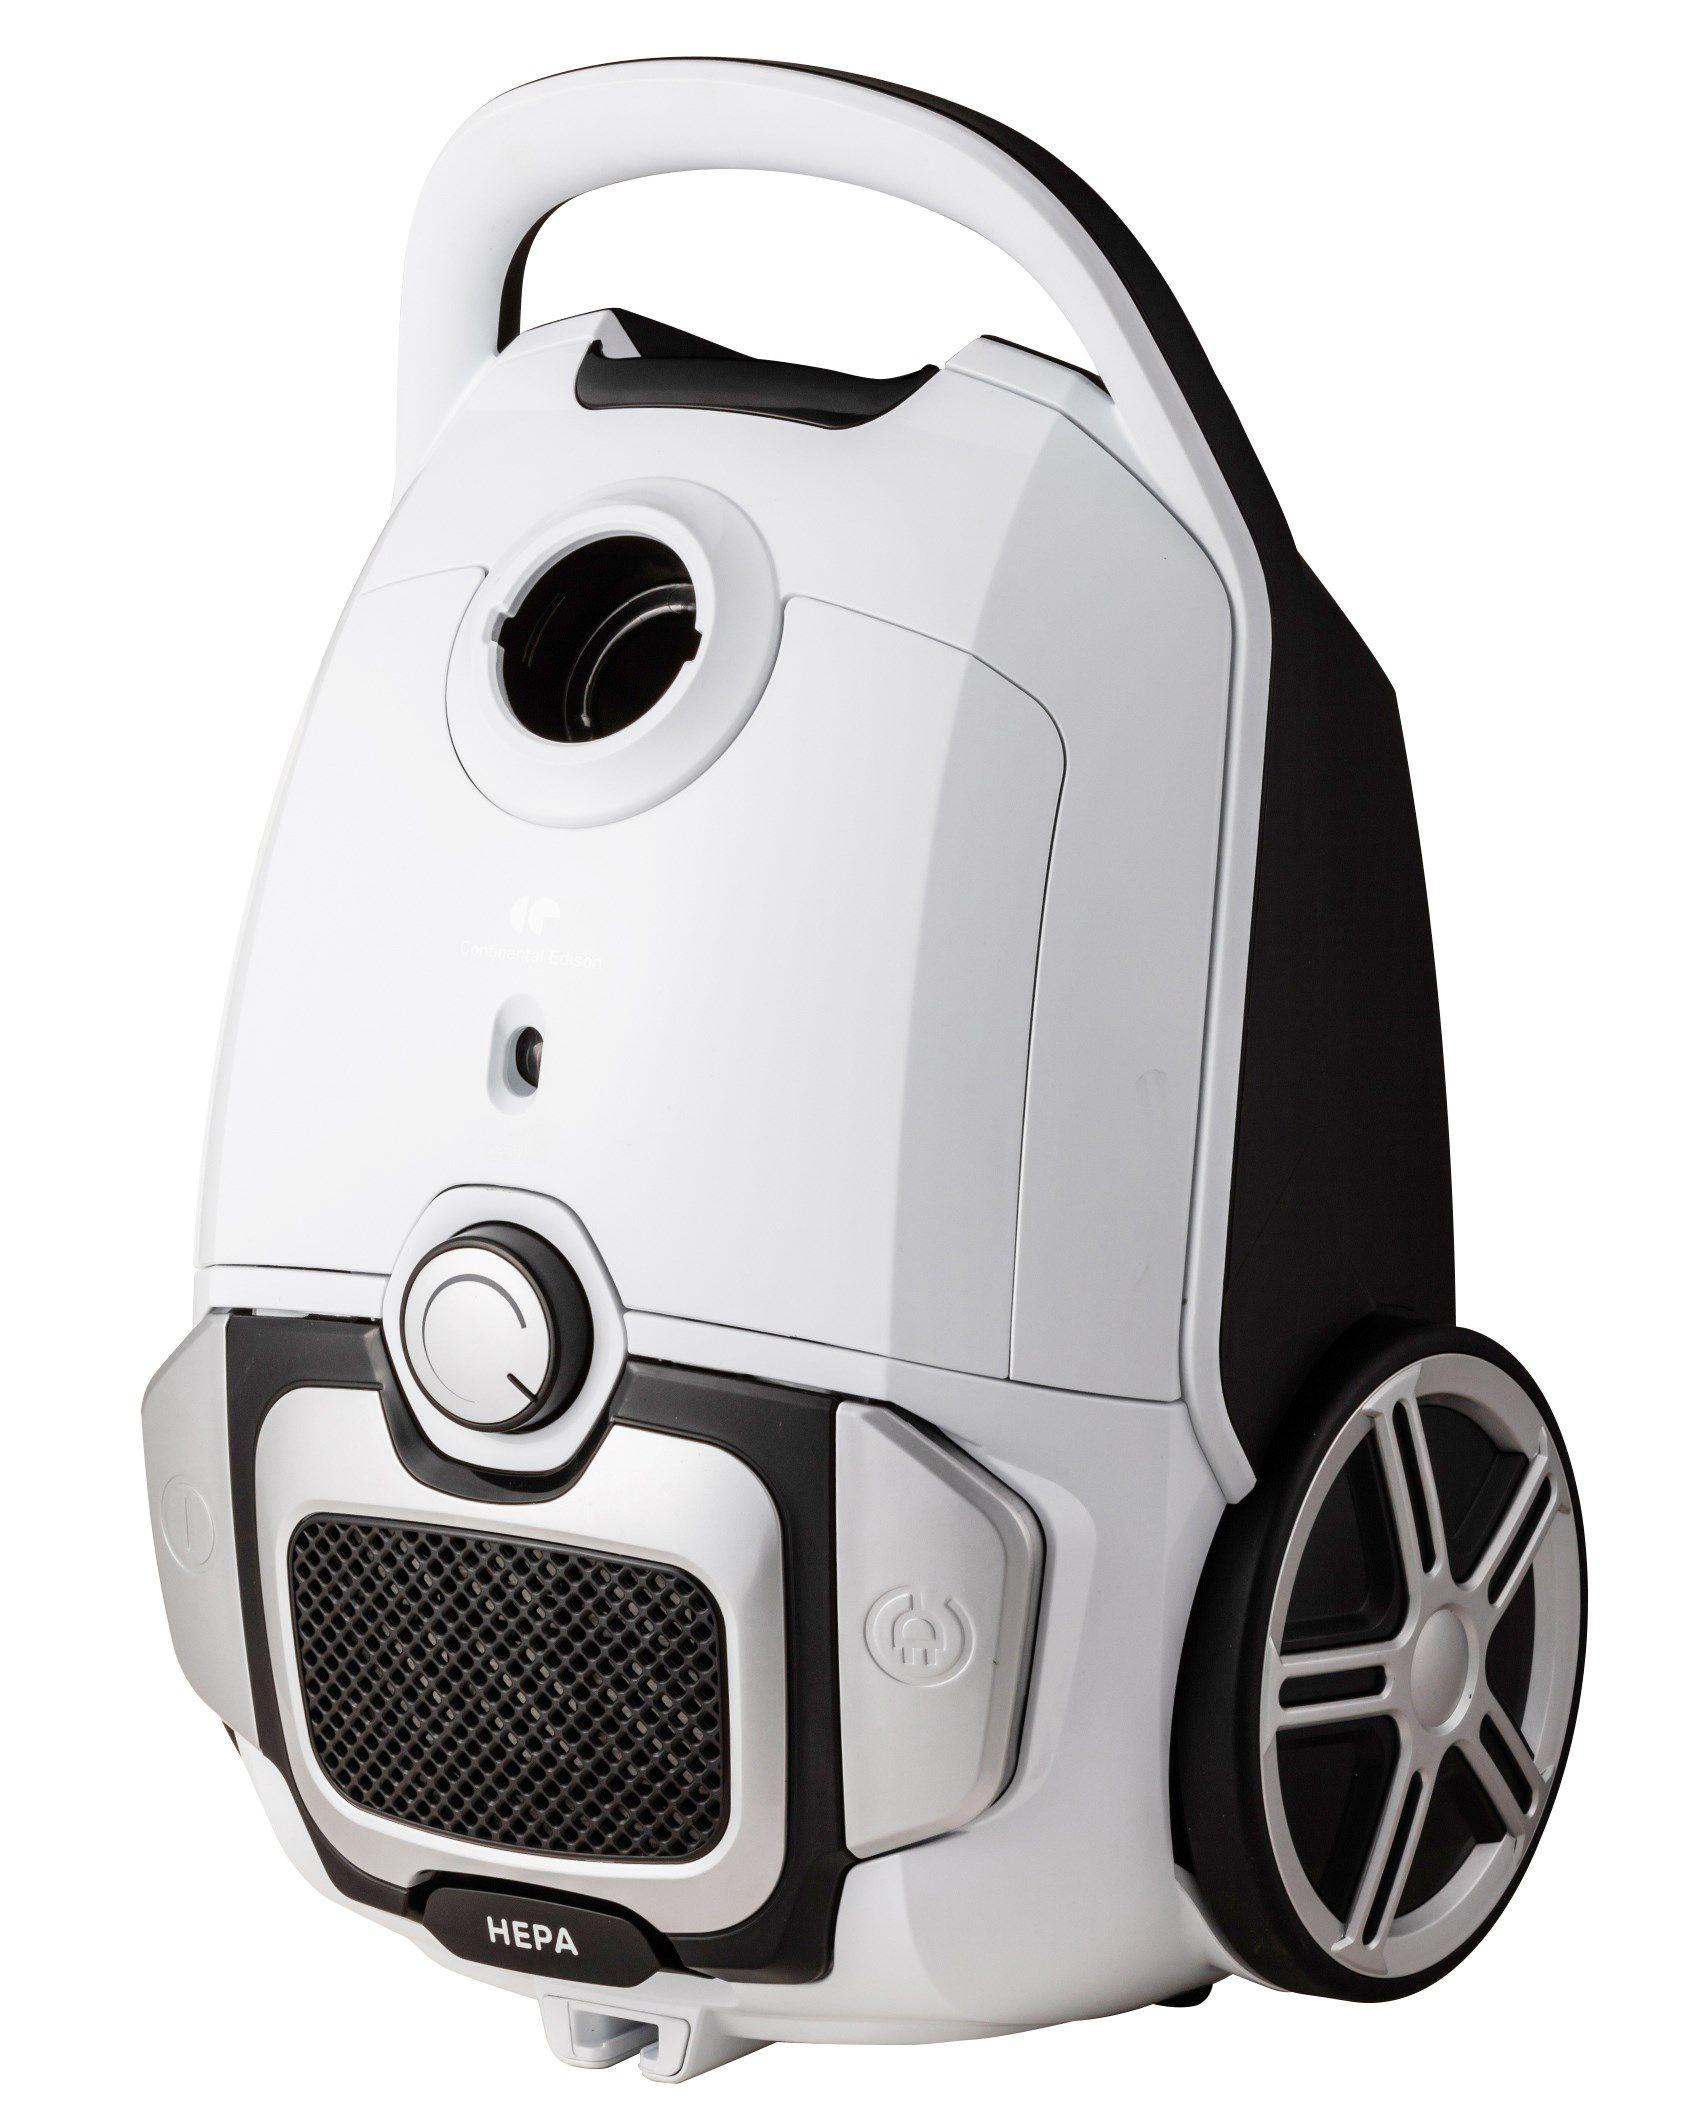 10 x FILTATEX sacs aspirateur Hoover telios class 1600 hoover telios class 1600 silent power